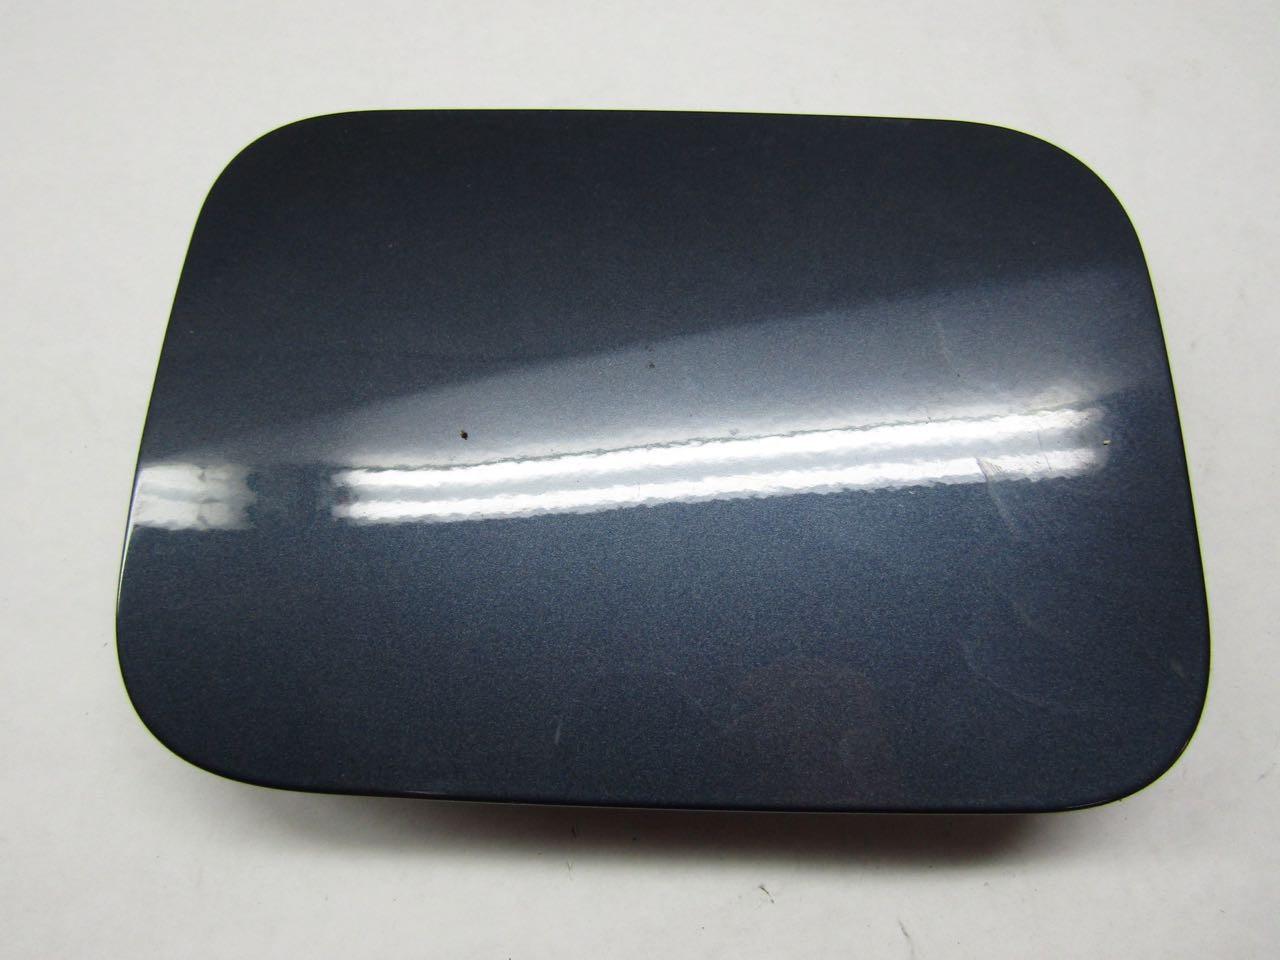 2013 Infiniti G37 Sedan Fuel Gas Door Blue Slate Raw Quality Factory Autoparts